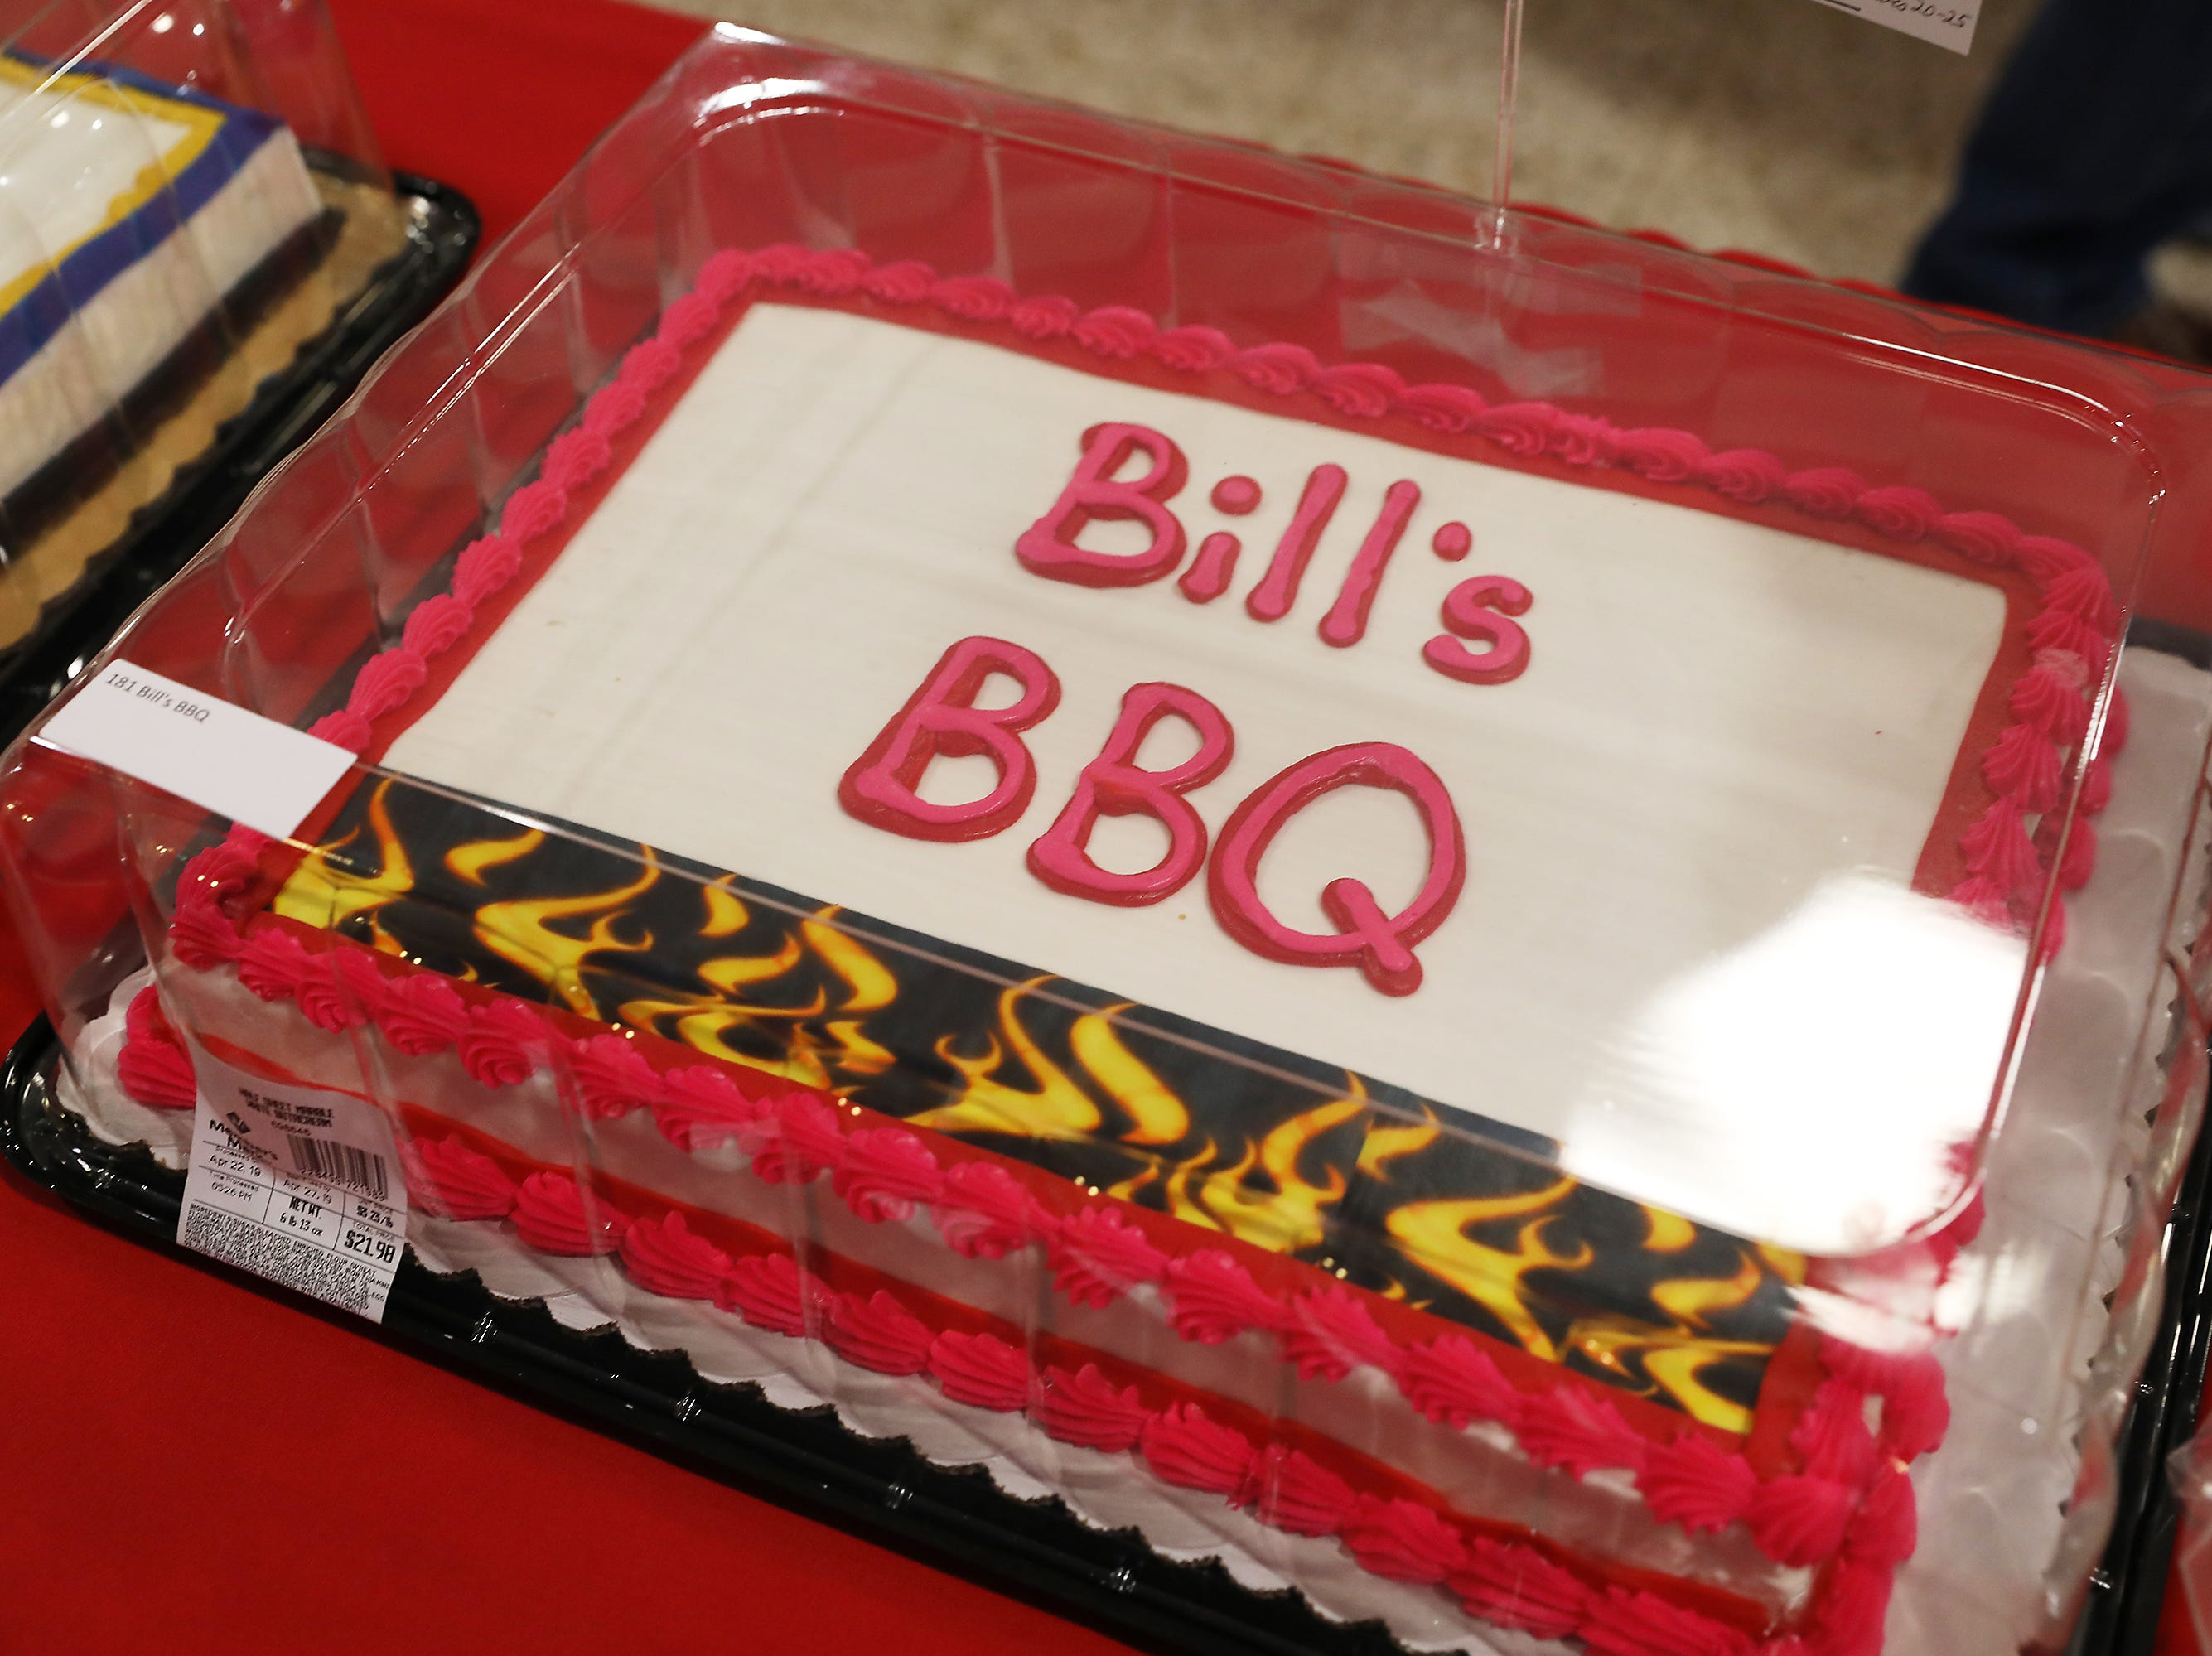 4:45 P.M. Thursday cake 181 Bill's BBQ - whole hog smoked; $600